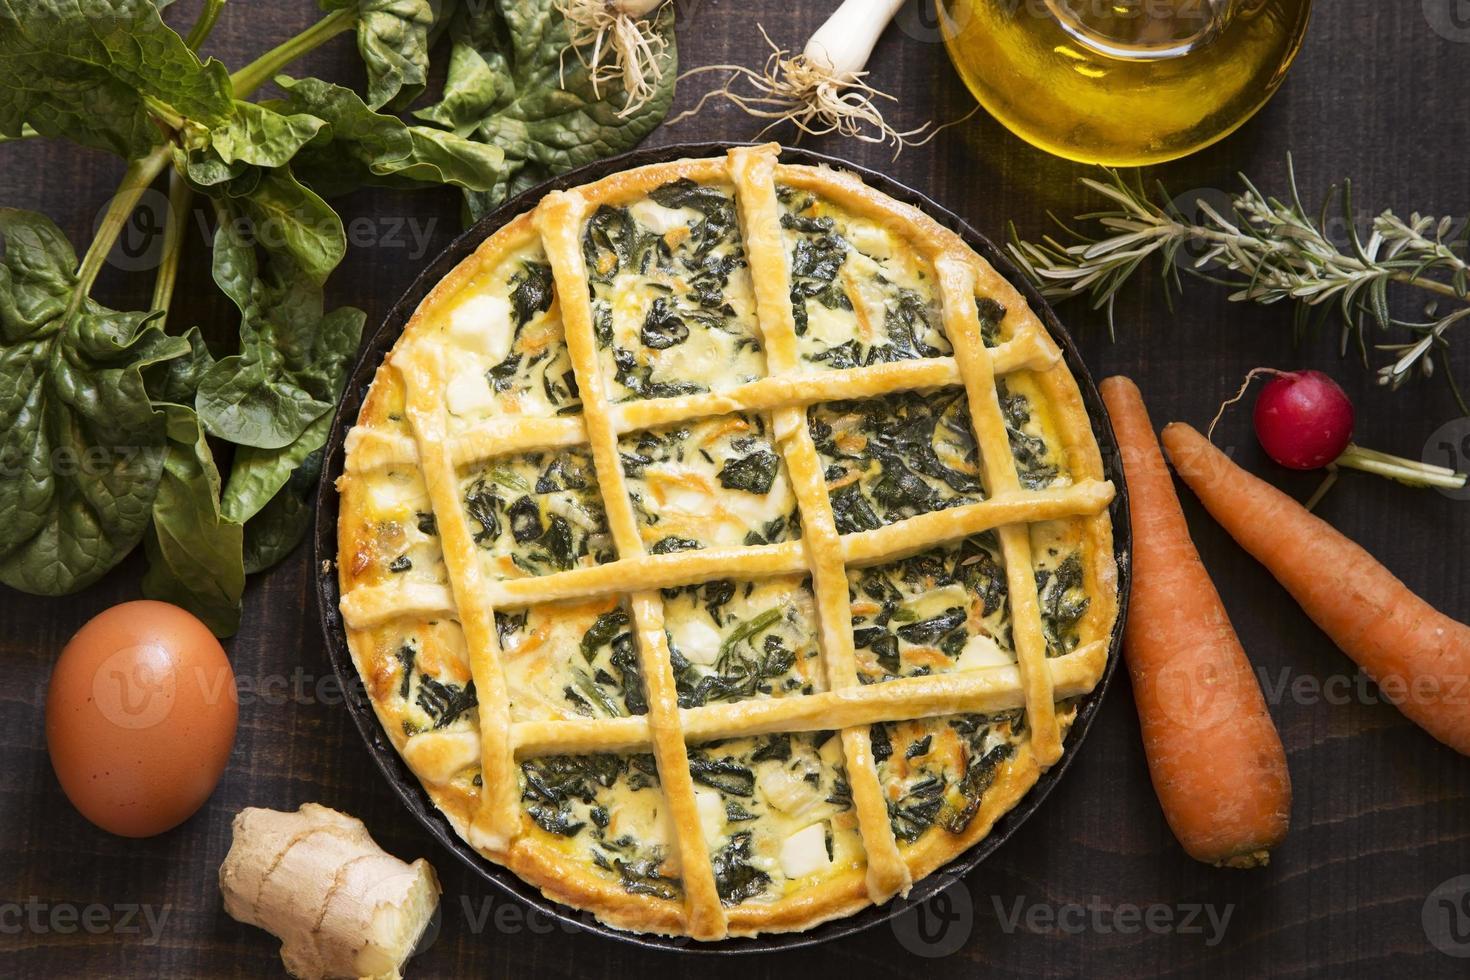 torta vegetariana foto